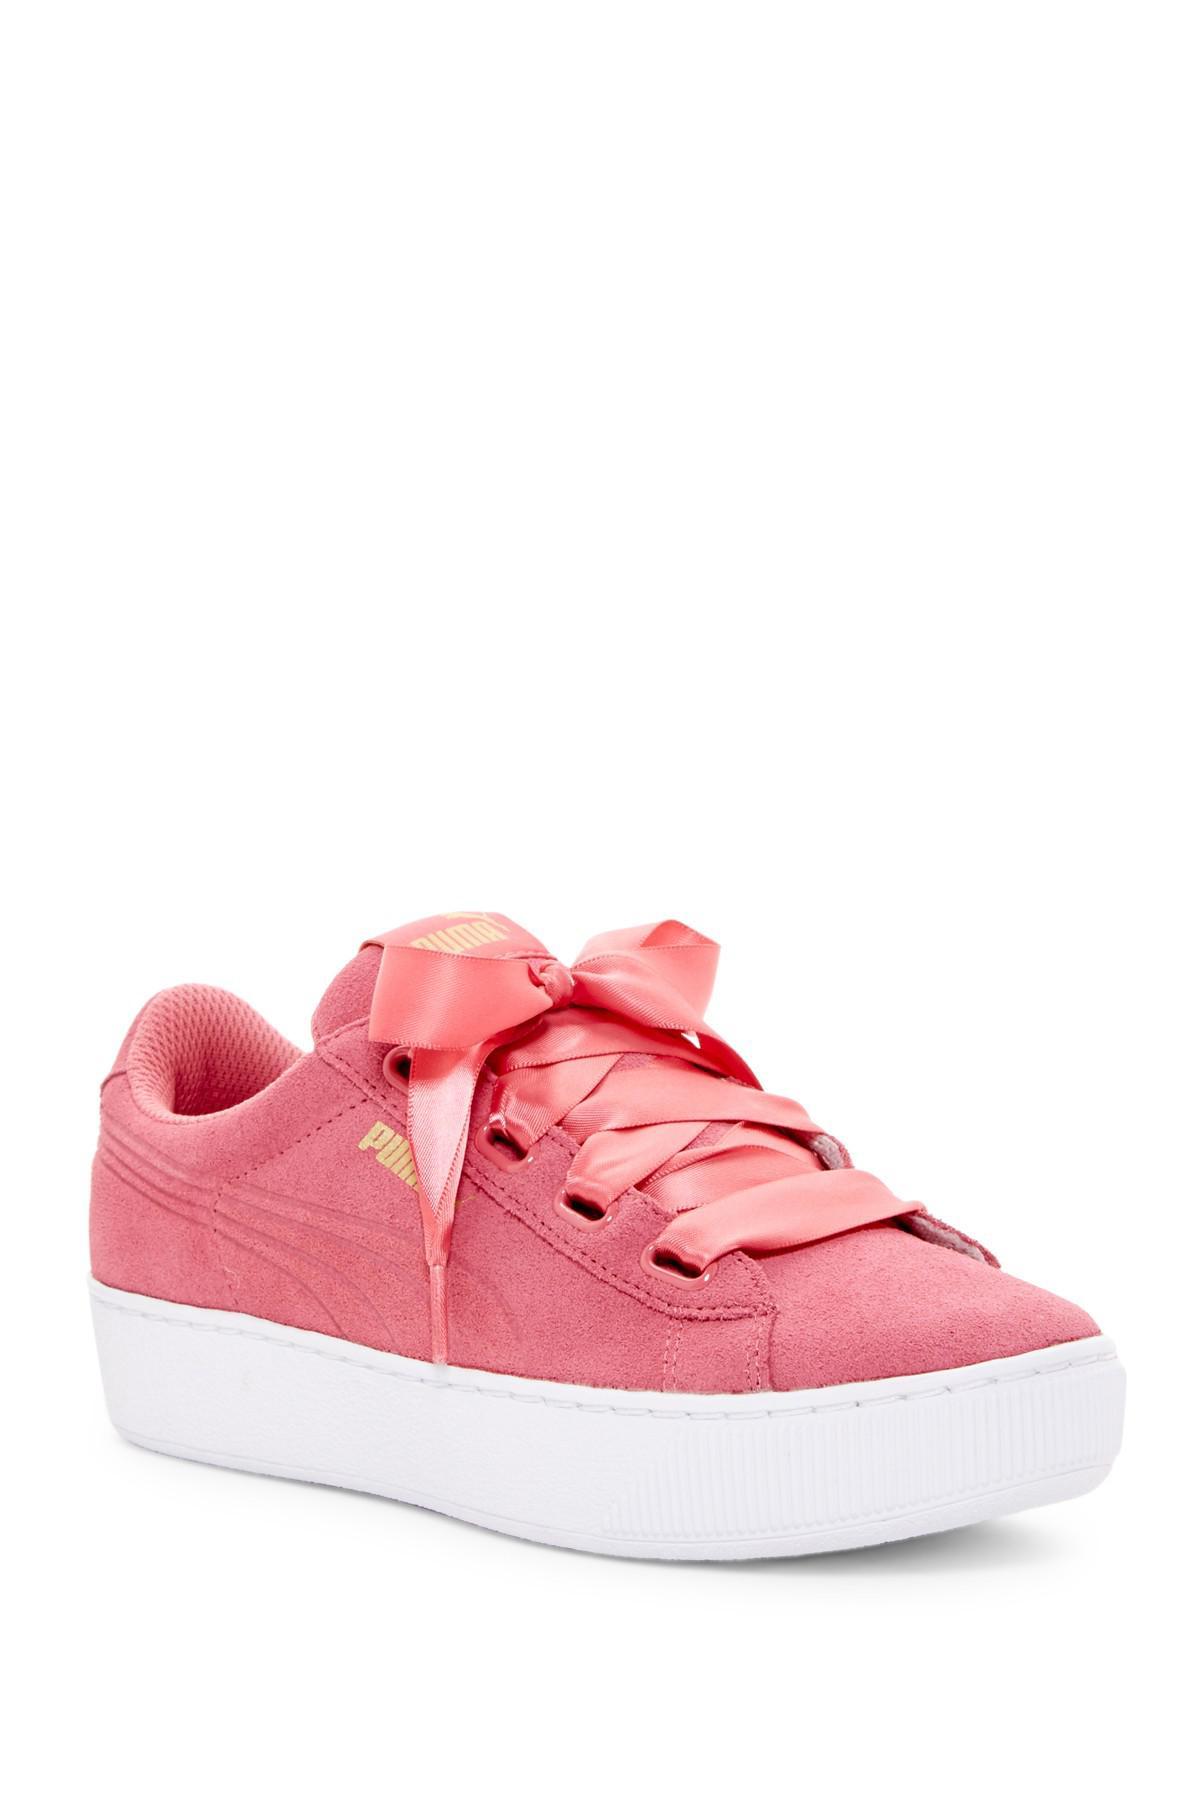 PUMA Suede Vikky Ribbon Platform Sneaker in Pink - Lyst